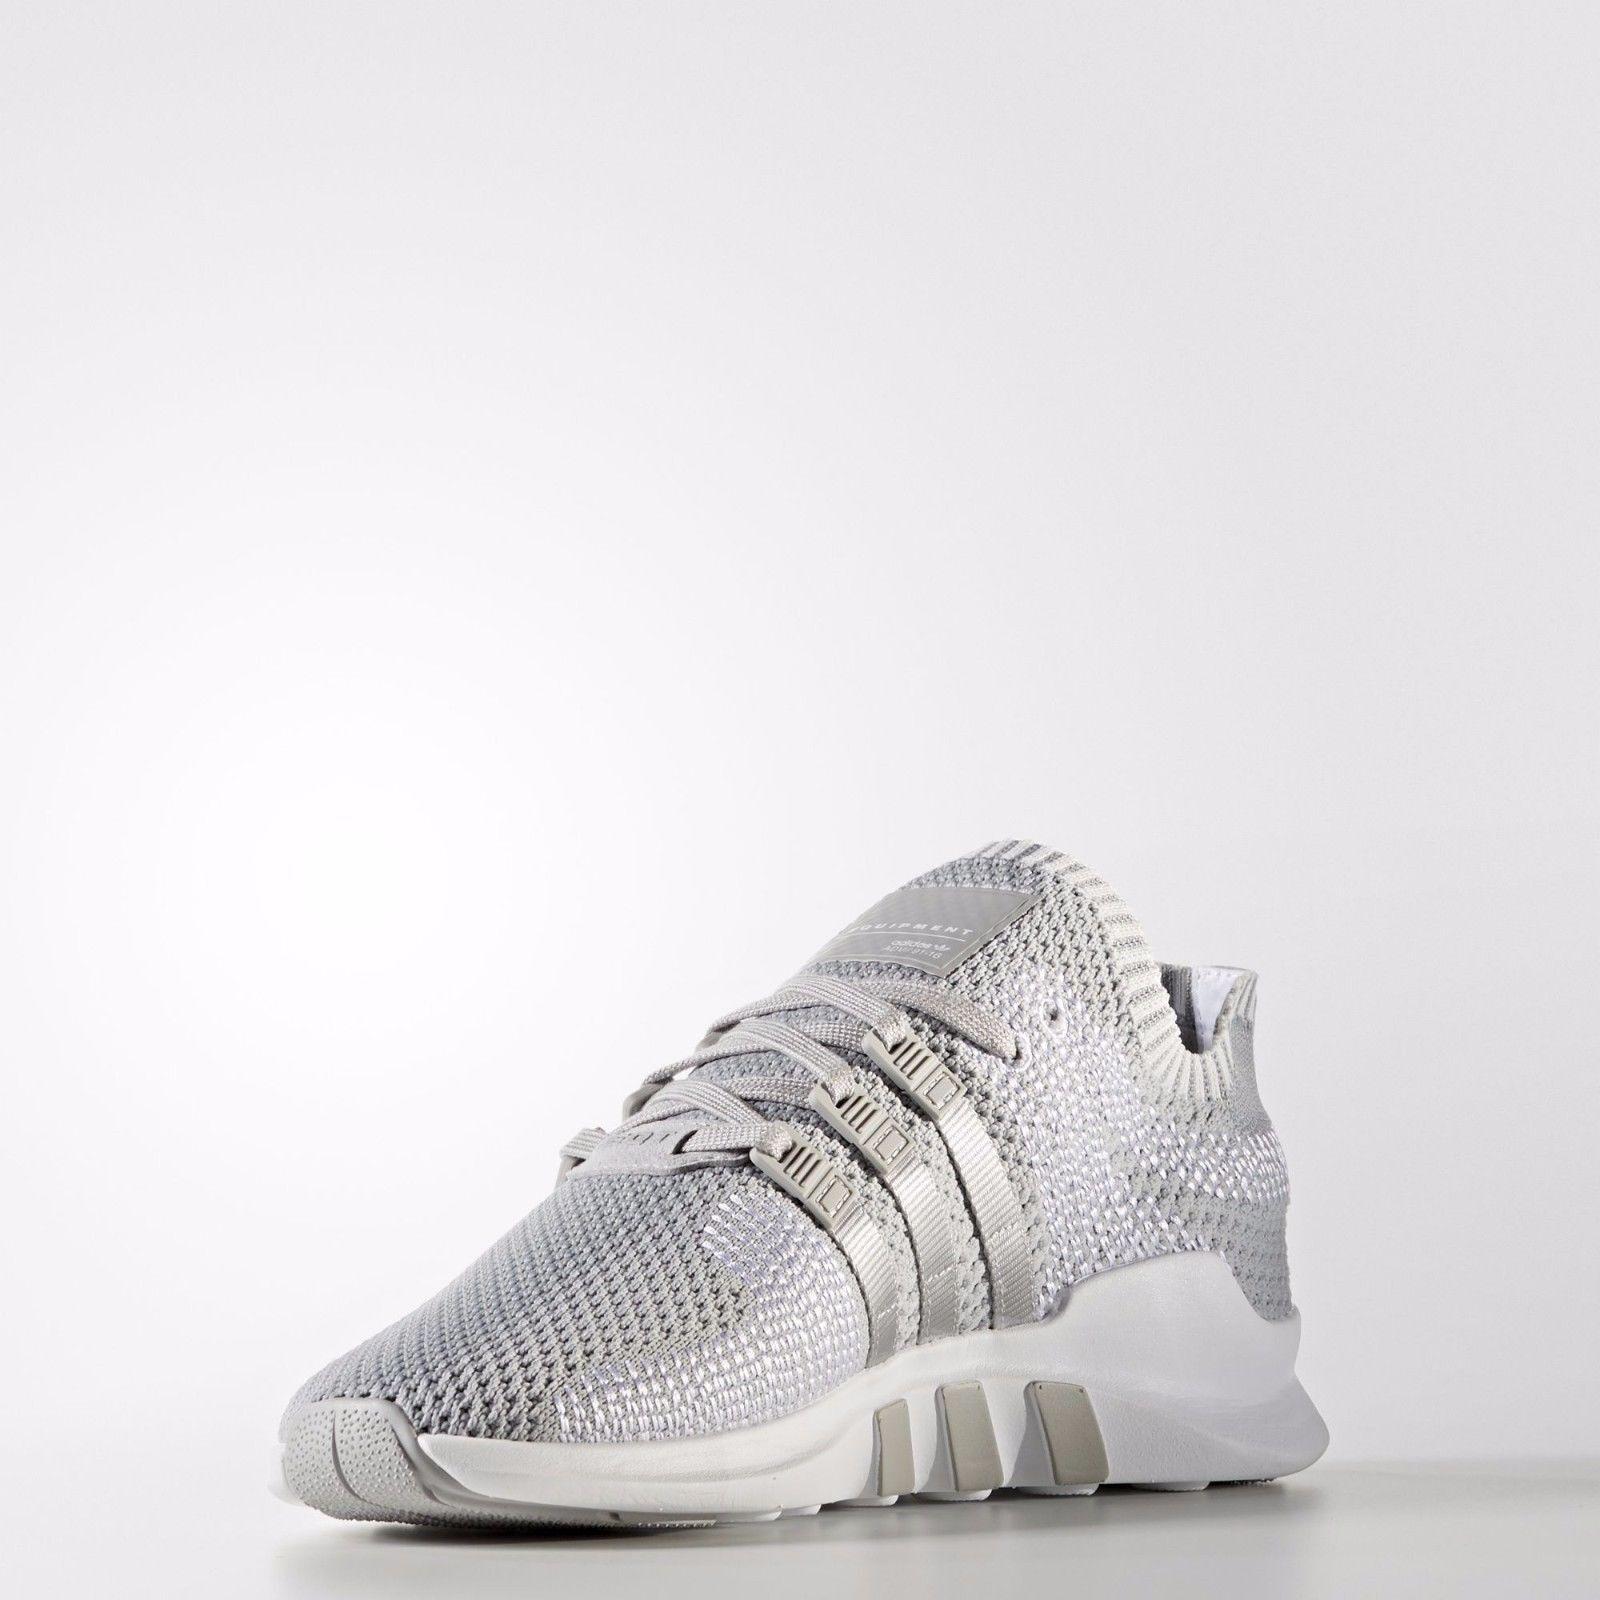 0de3dd7fd7071 Adidas EQT EQT EQT Support ADV PK Primeknit Running shoes Grey White Sz 11.5  BY9392 cb9f4b